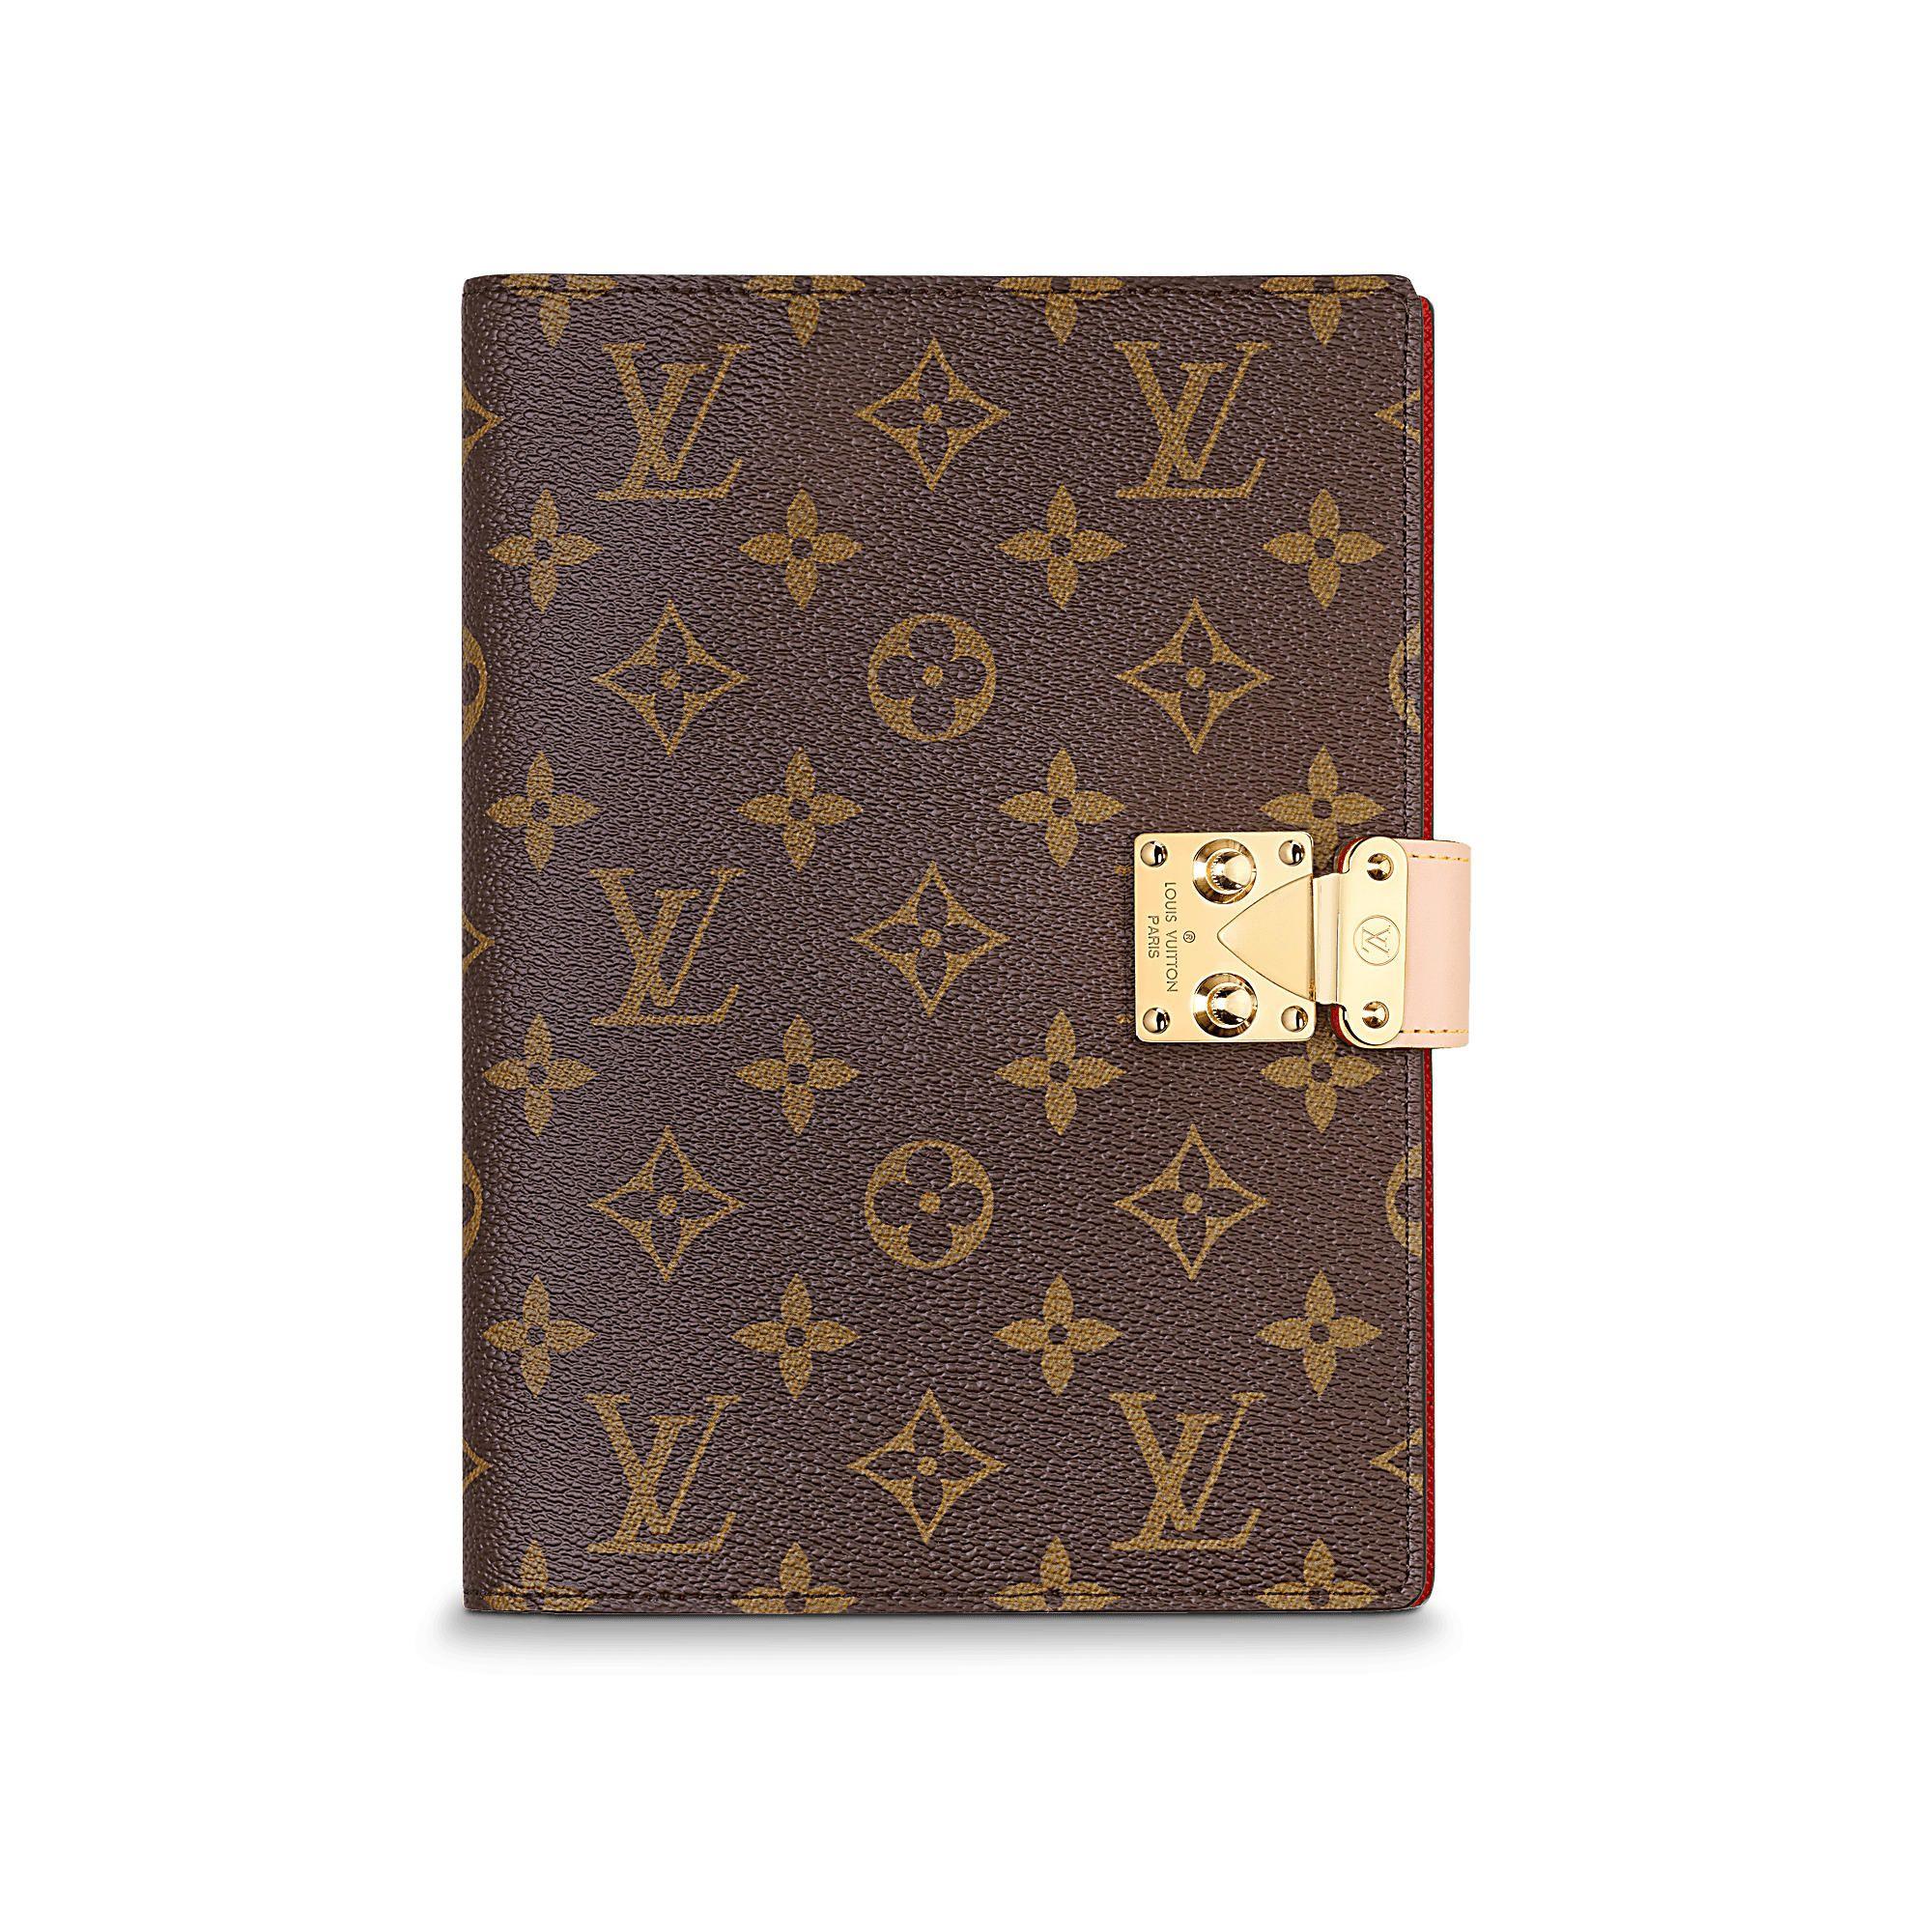 a4f9c662d7586 Notebook Cover Paul MM via Louis Vuitton